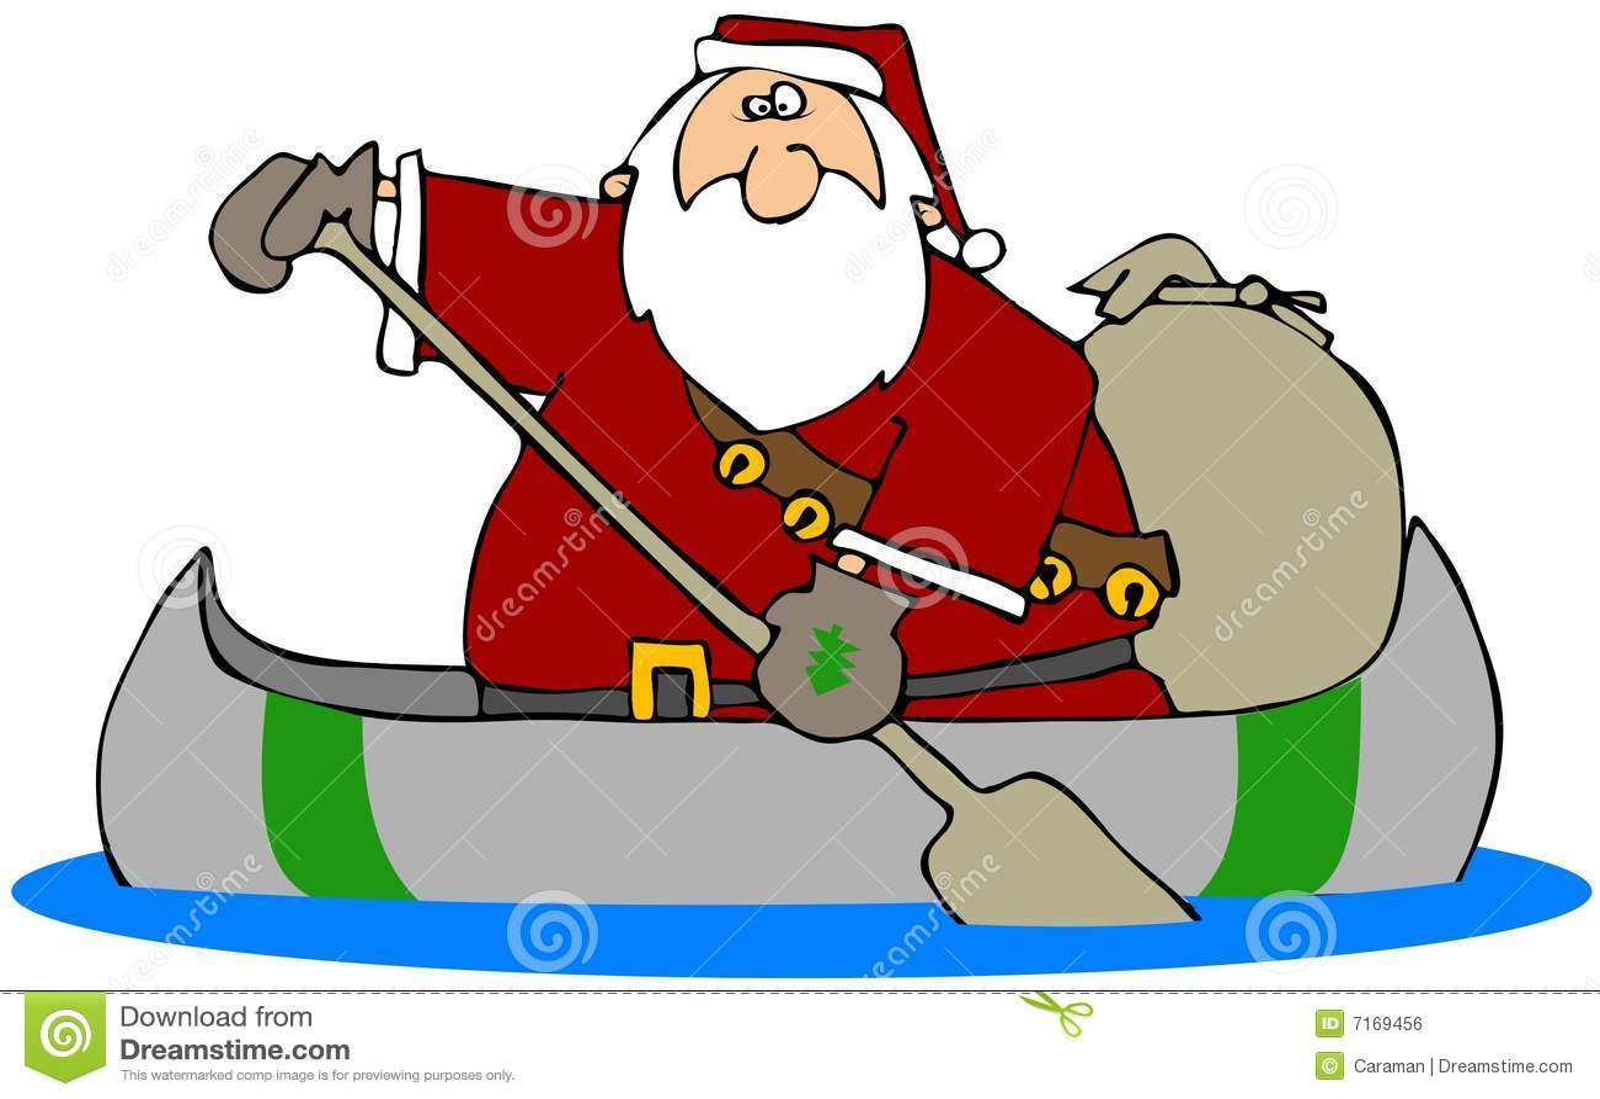 Santa in a canoe stock illustration image of paddle boat